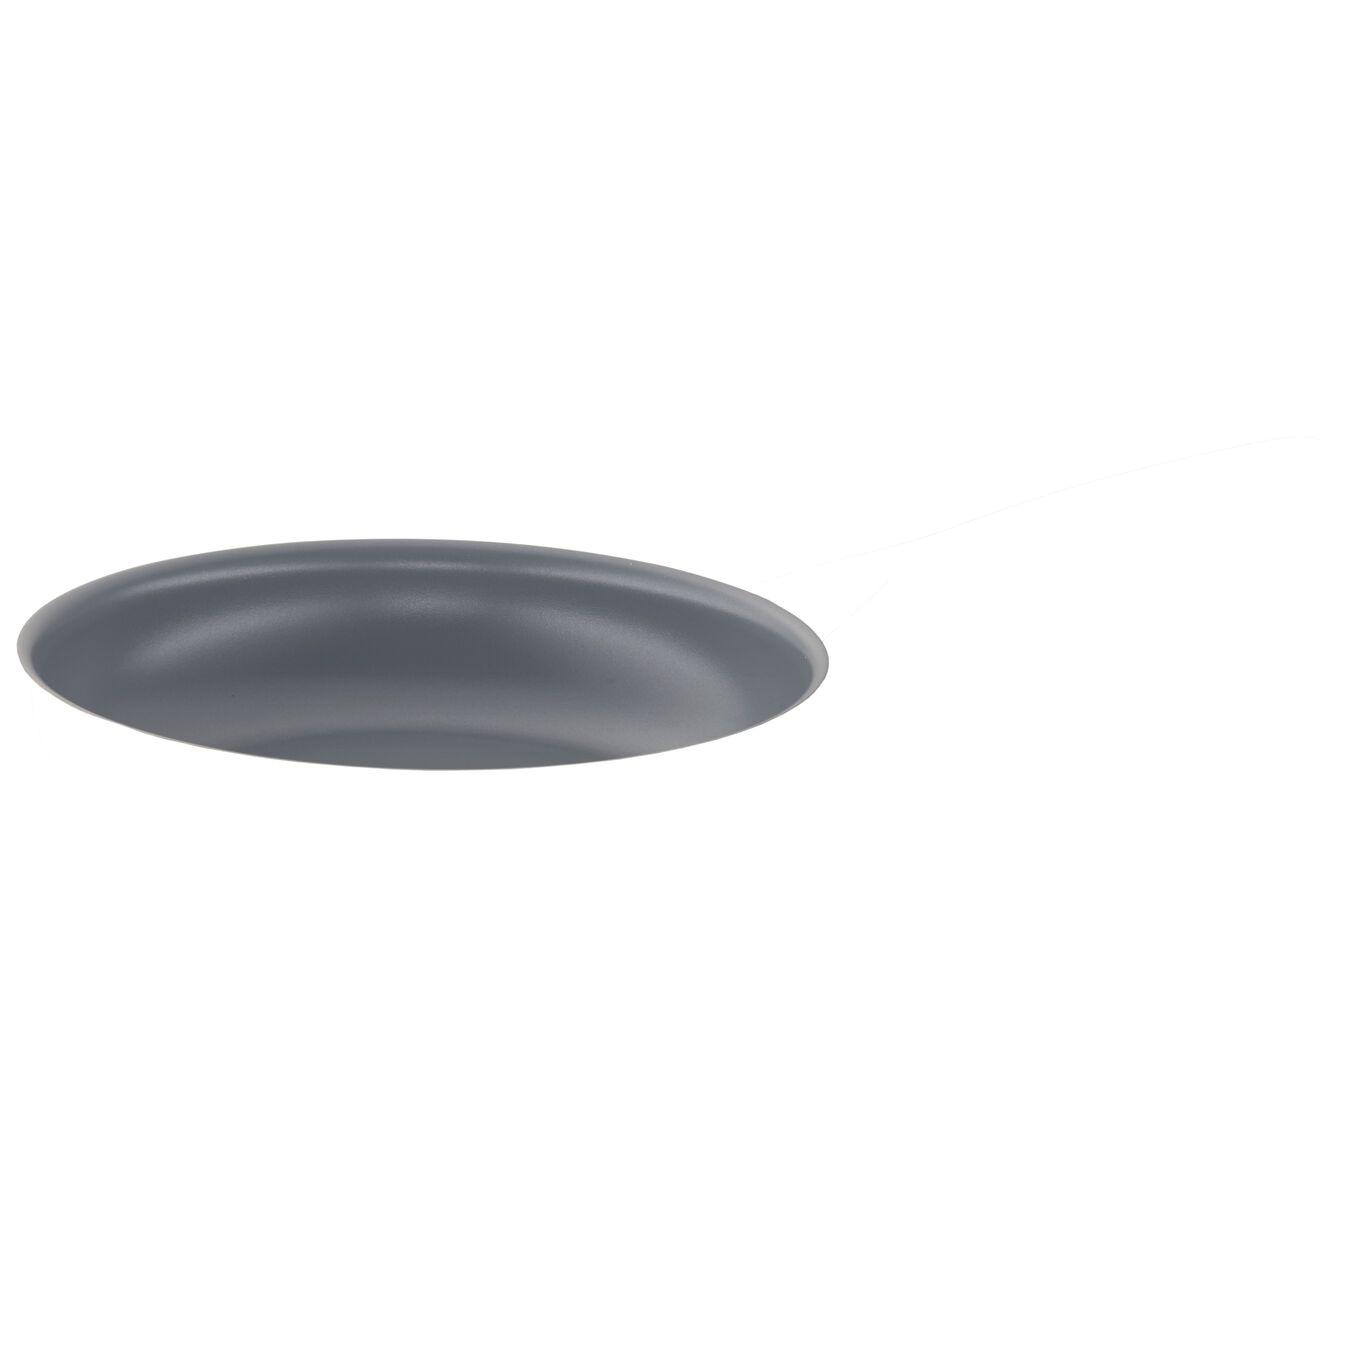 Bratpfanne 20 cm, 18/10 Edelstahl, Silber,,large 2